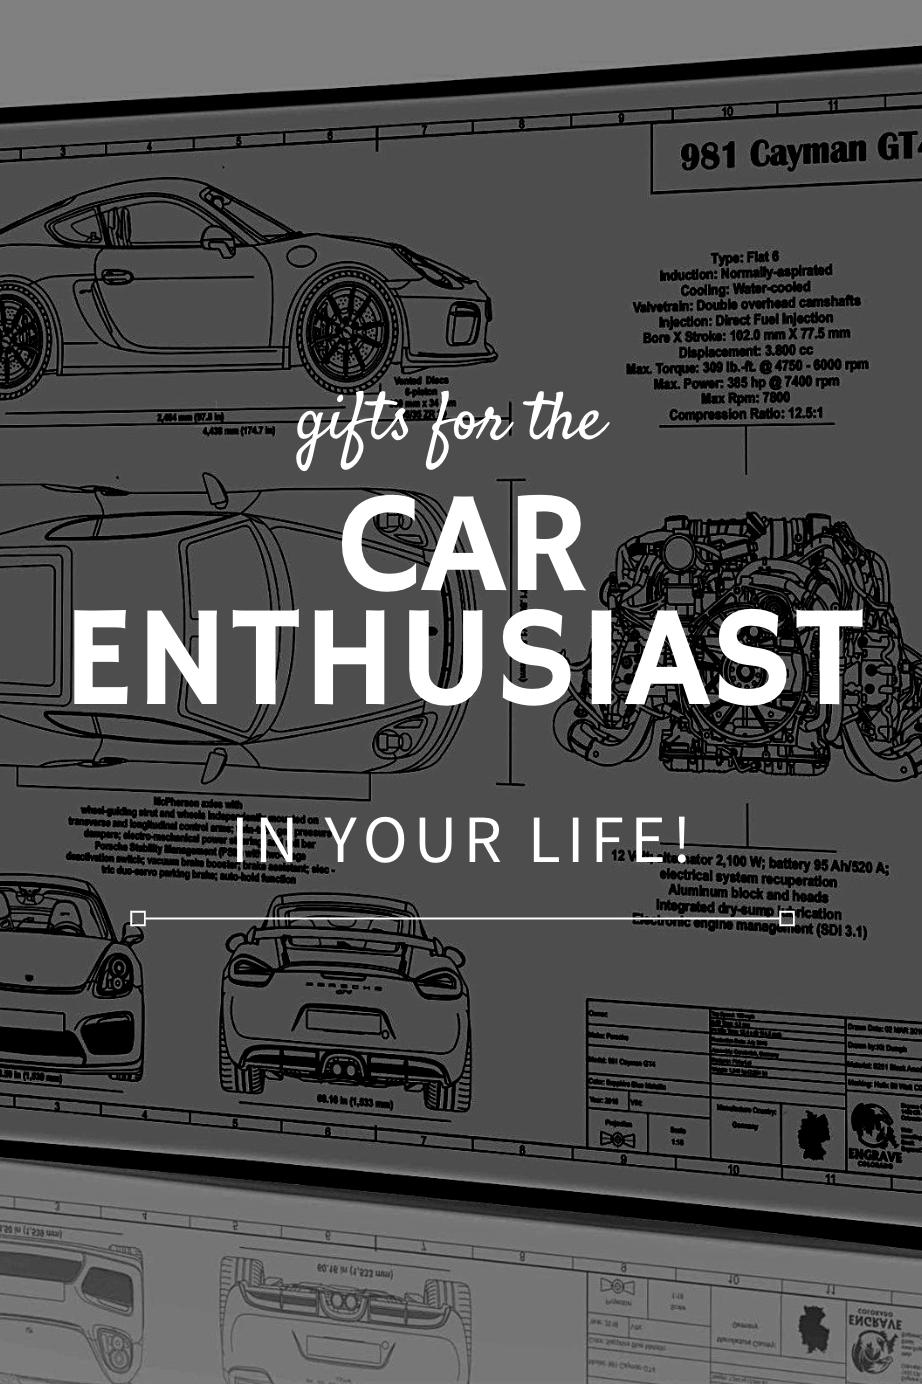 Gifts For The Car Enthusiast In Your Life Modern Car Wall Decor Porsche Wall Art Car Wall Art Blueprint Art Large Metal Wall Art